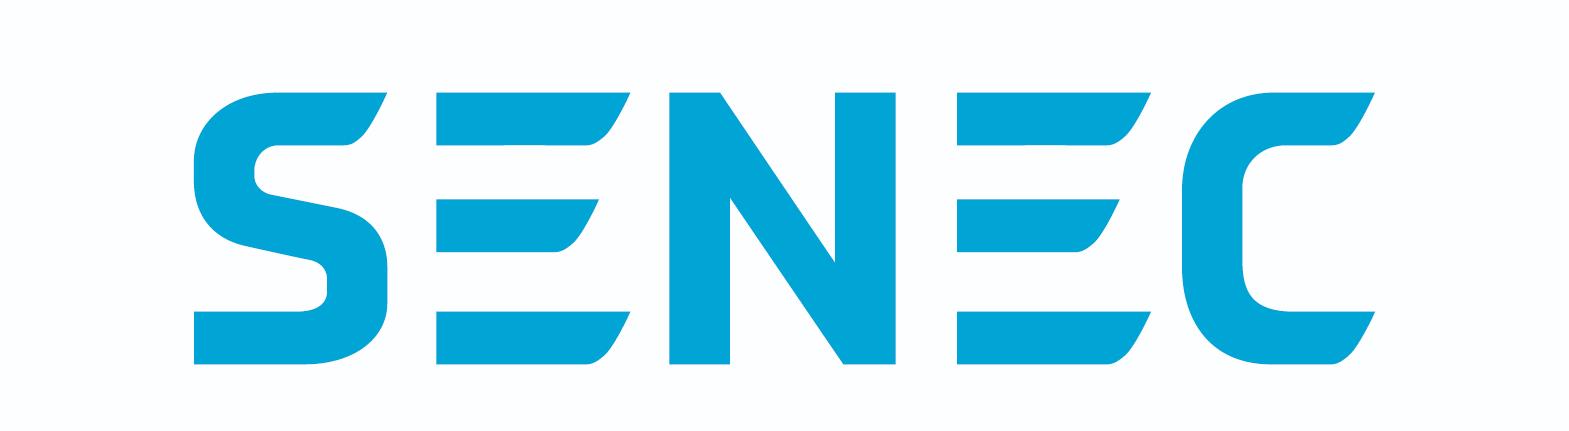 SENEC Deutsche Energieversorgung GmbH Logo